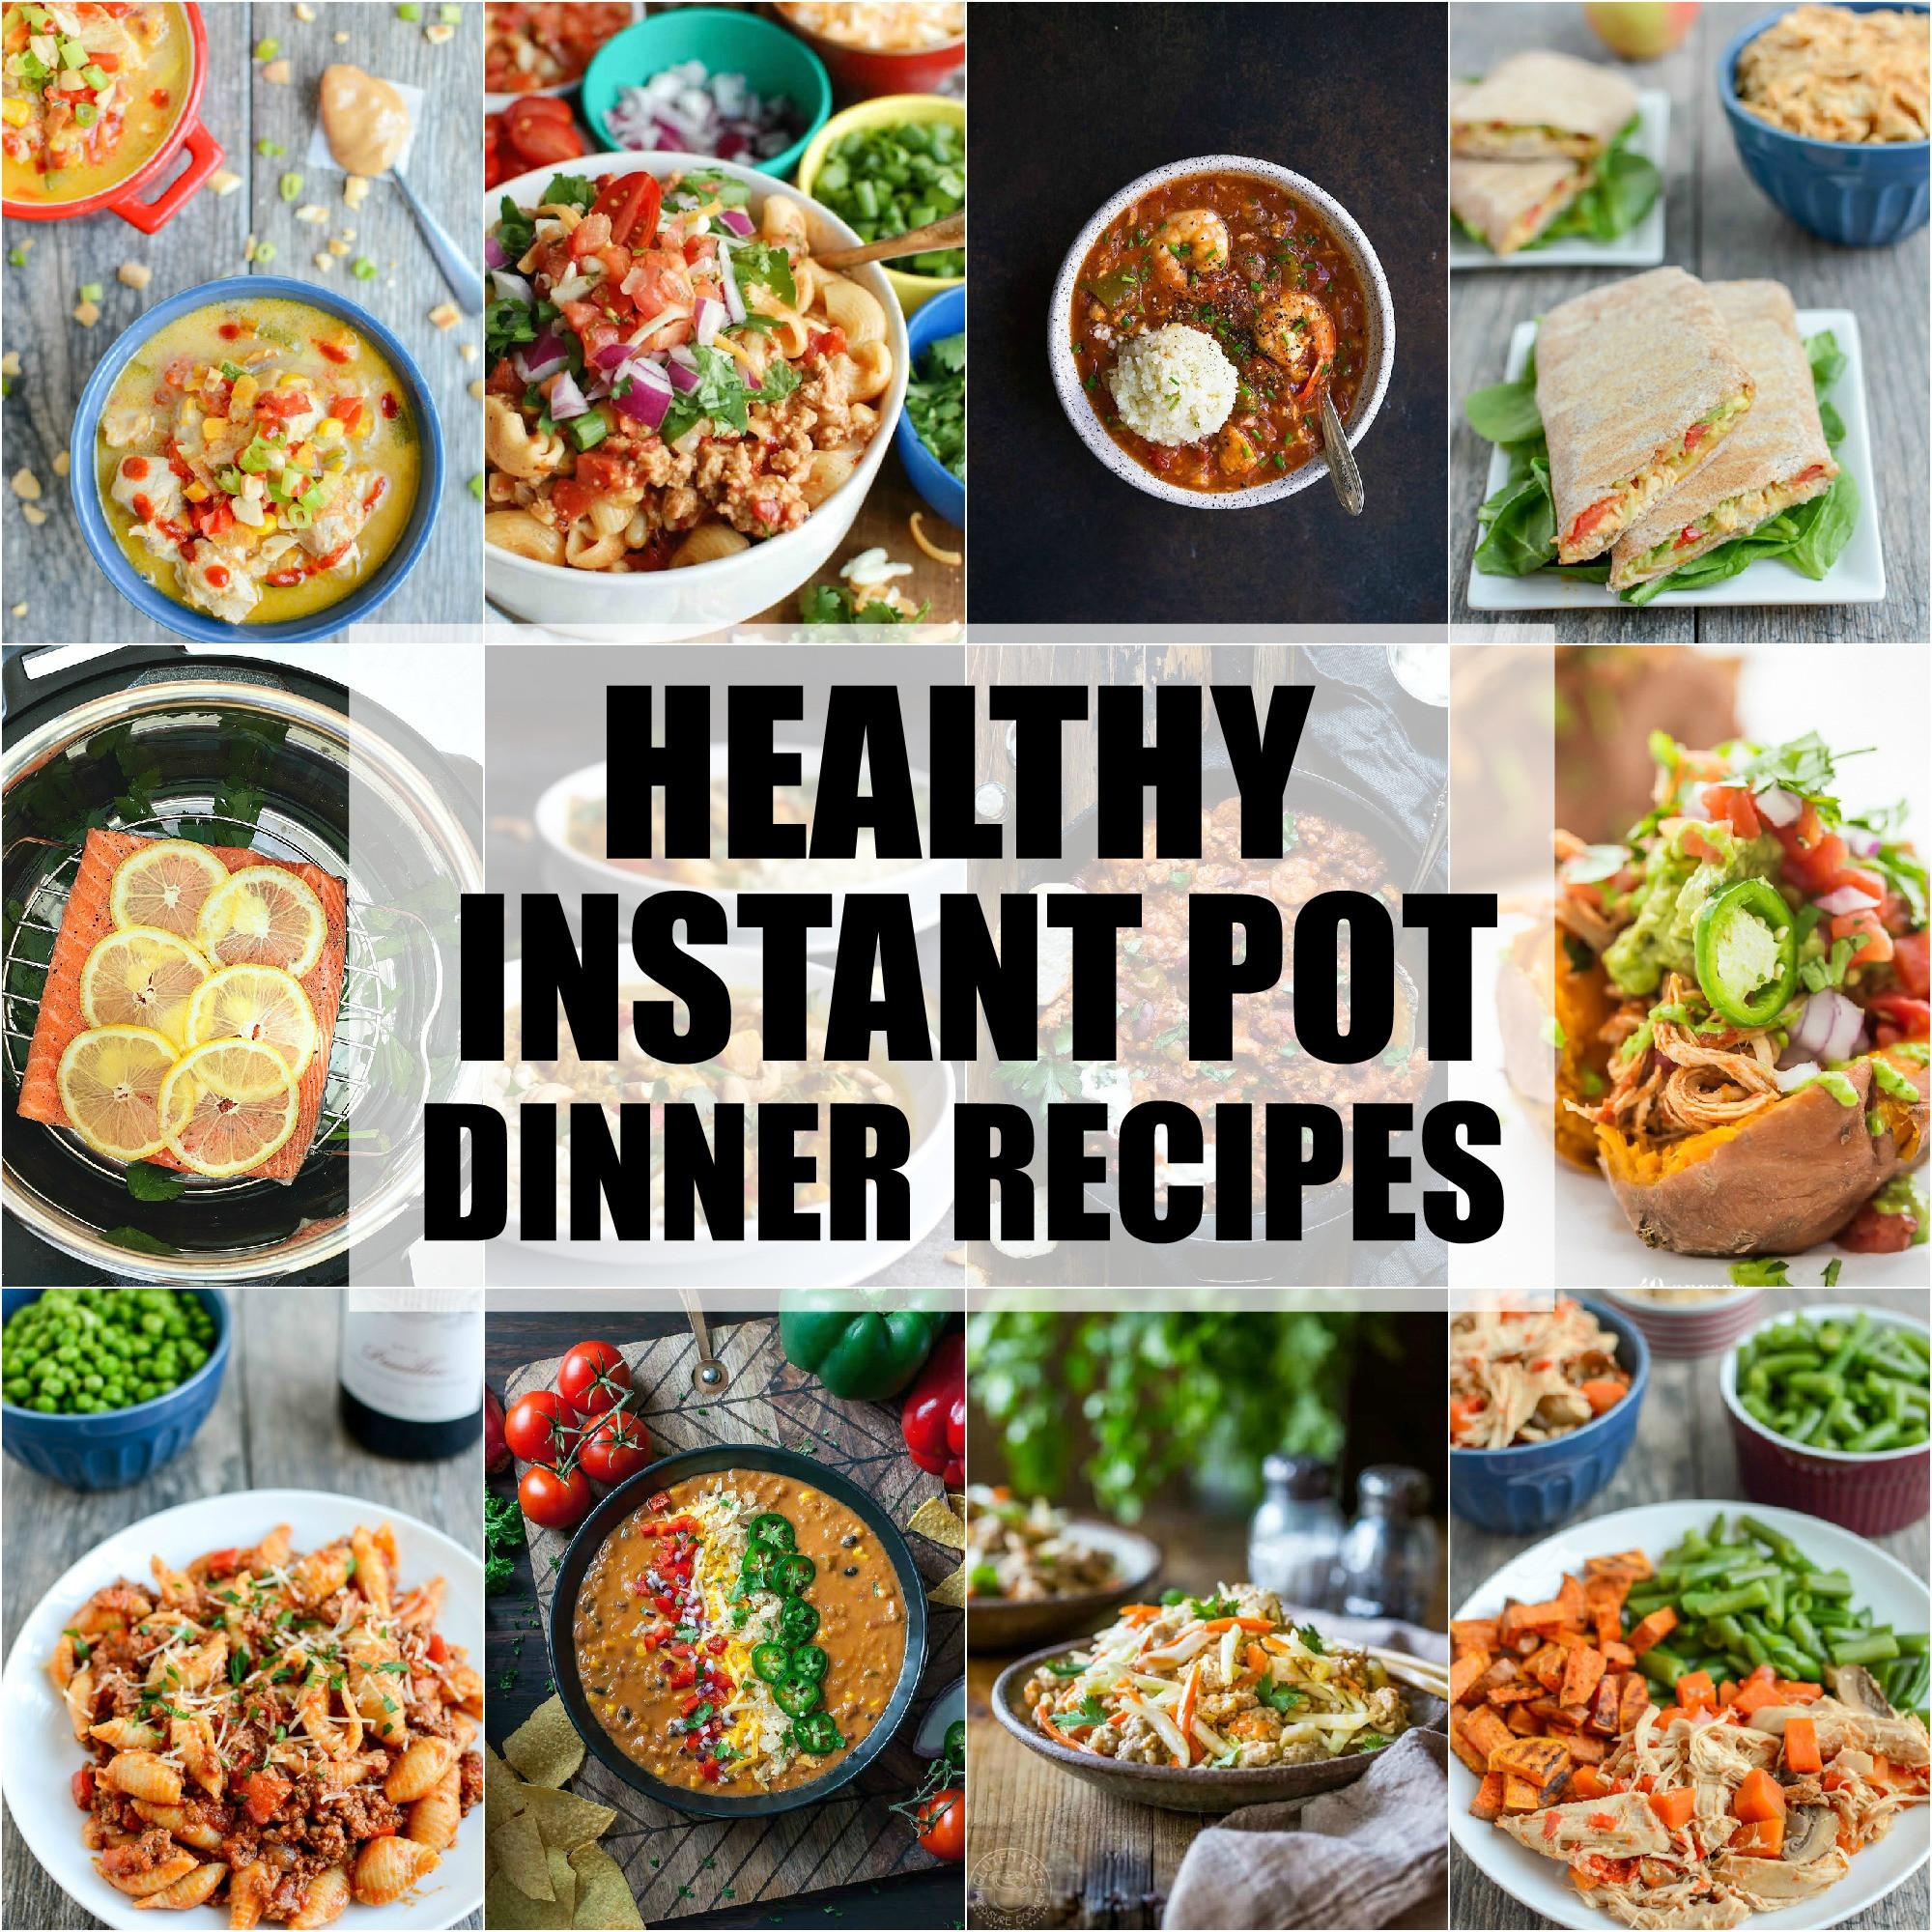 Instant Pot Healthy Desserts  Healthy Instant Pot Dinner Recipes